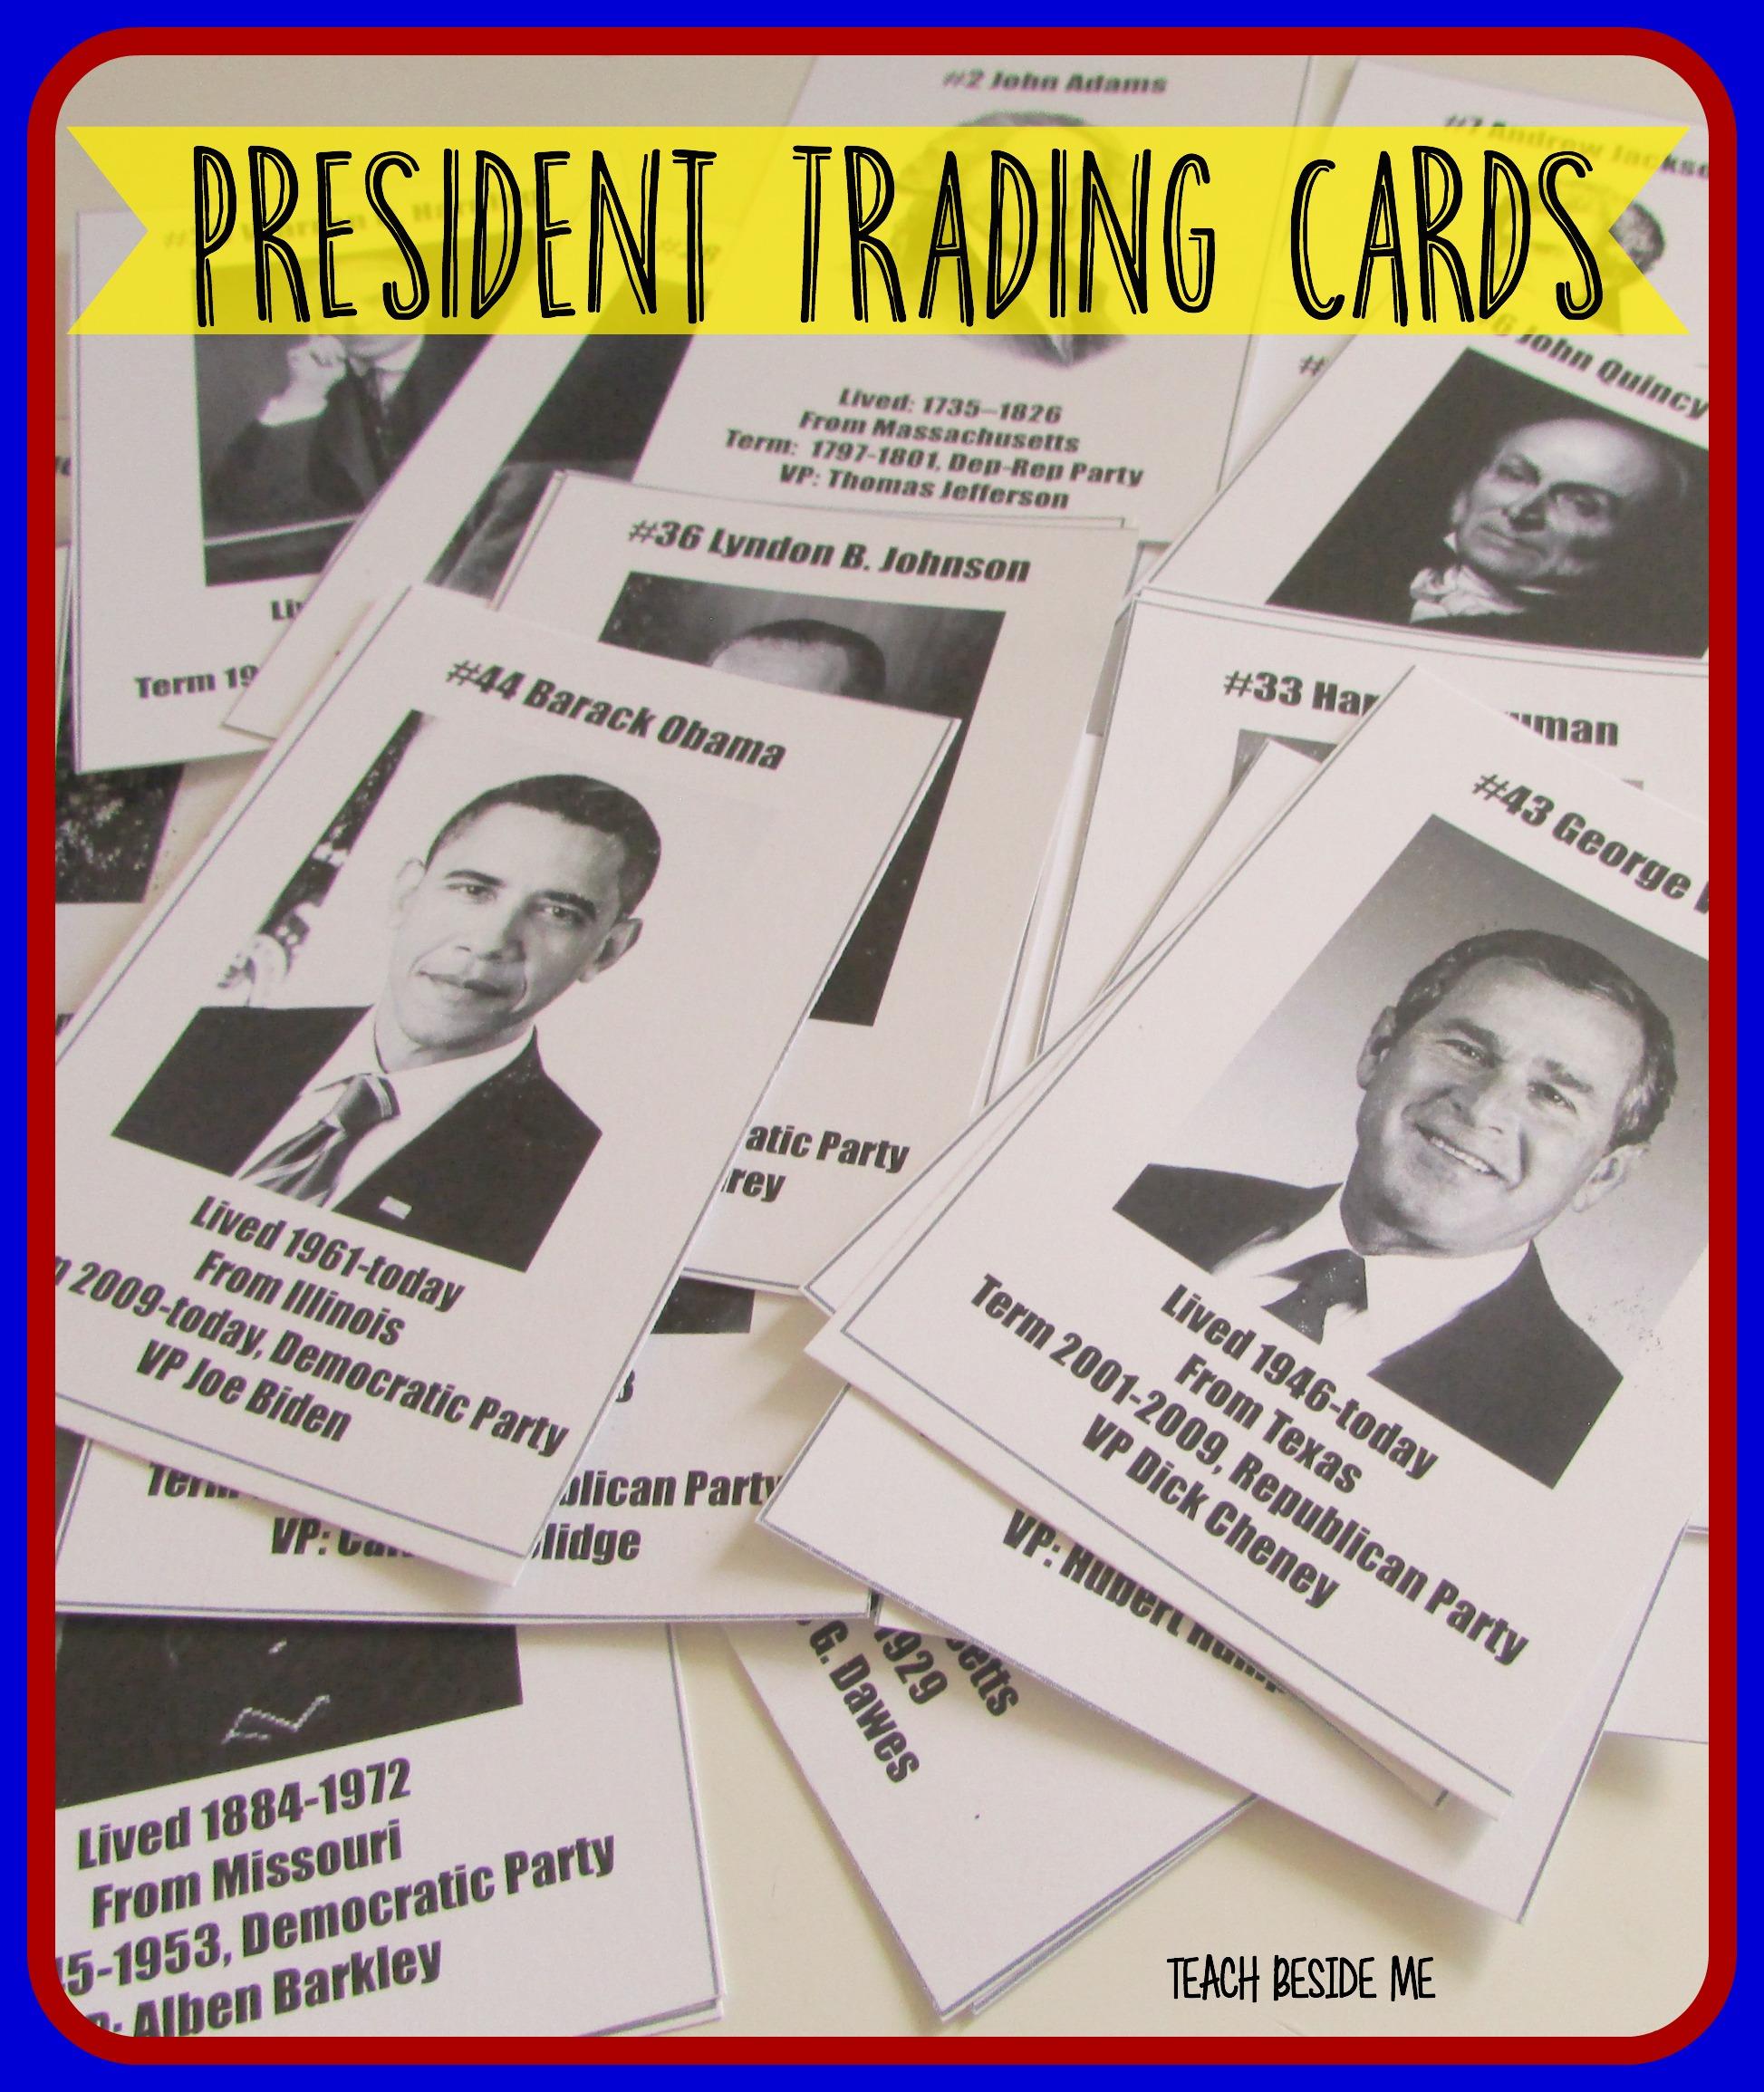 President Trading Cards